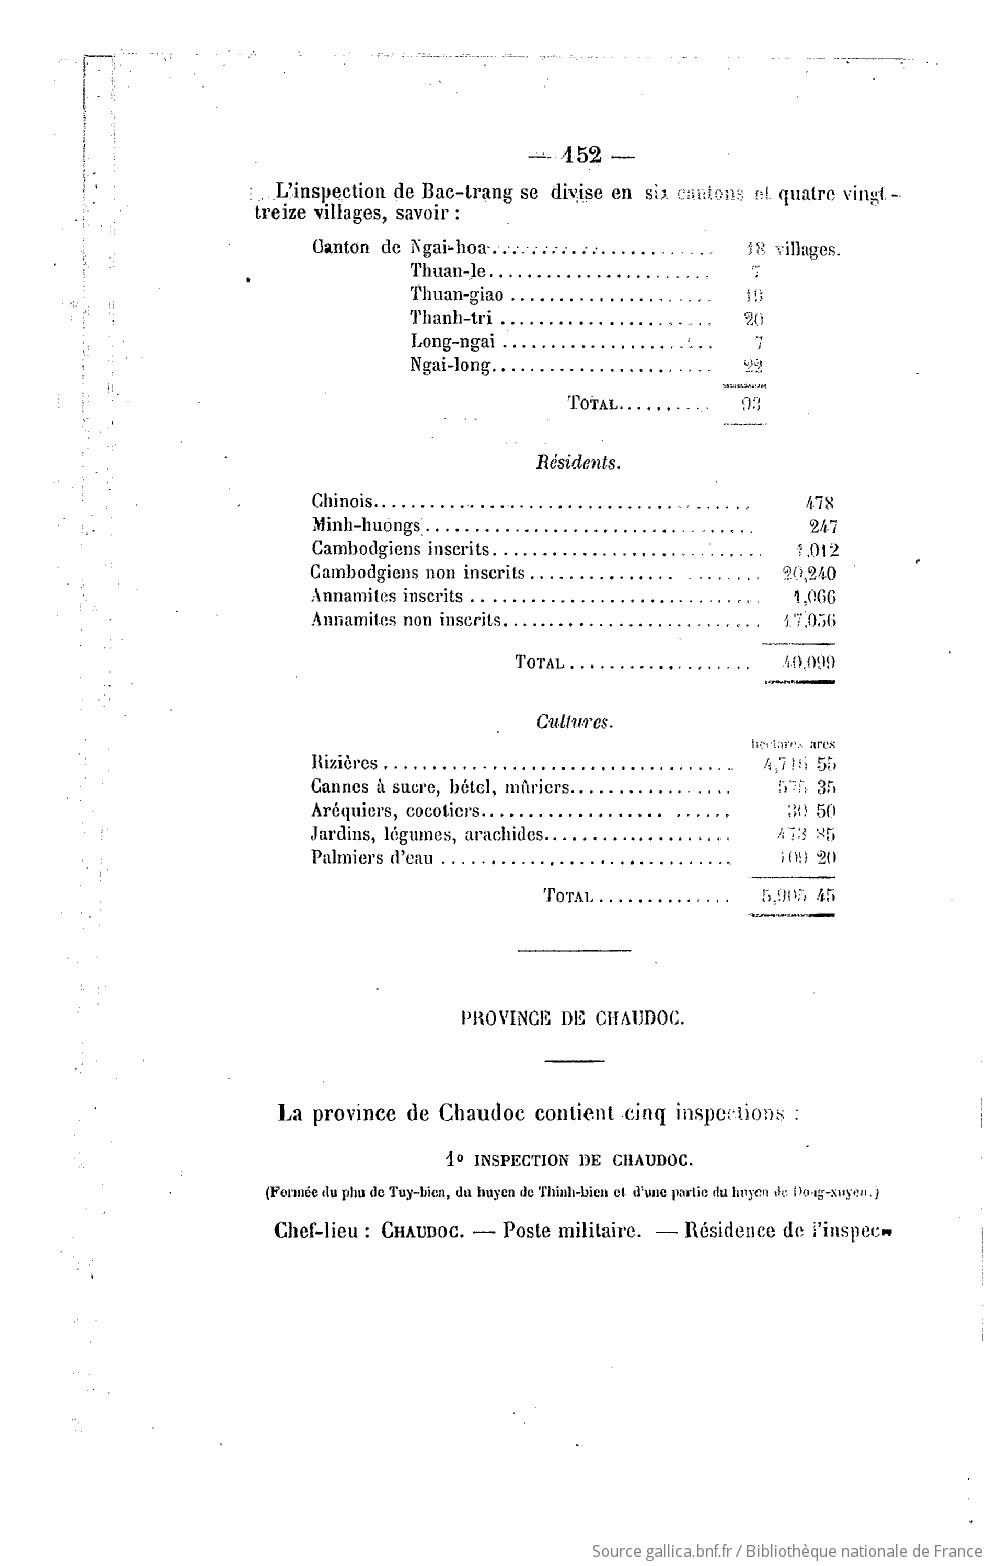 http://gallica.bnf.fr/ark:/12148/bpt6k5773010x/f154.highres